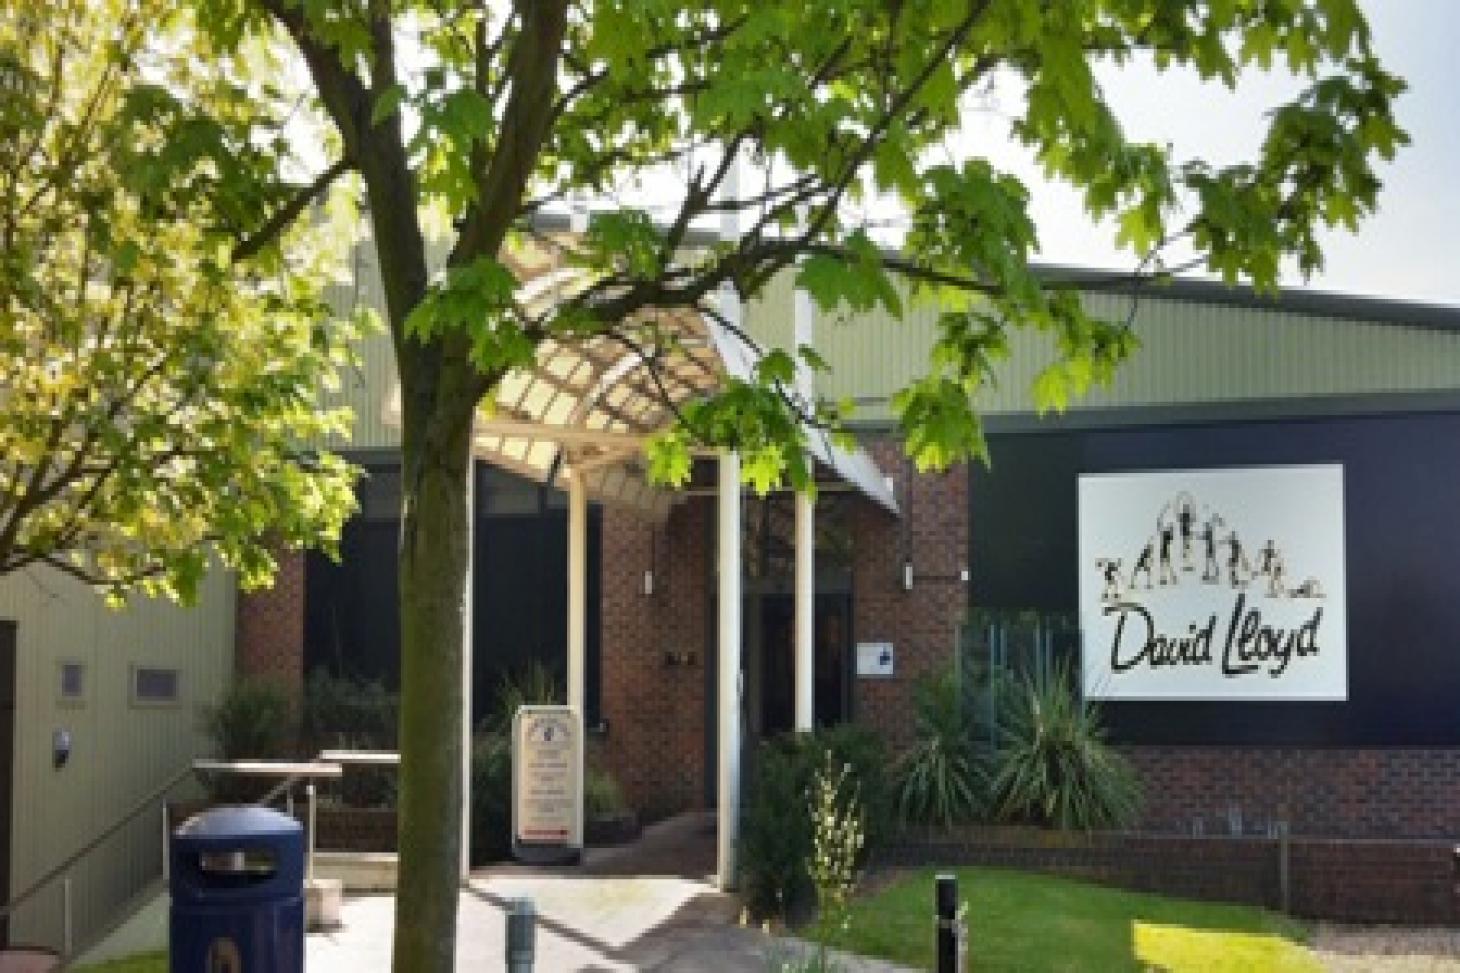 David Lloyds Raynes Park Indoor tennis court